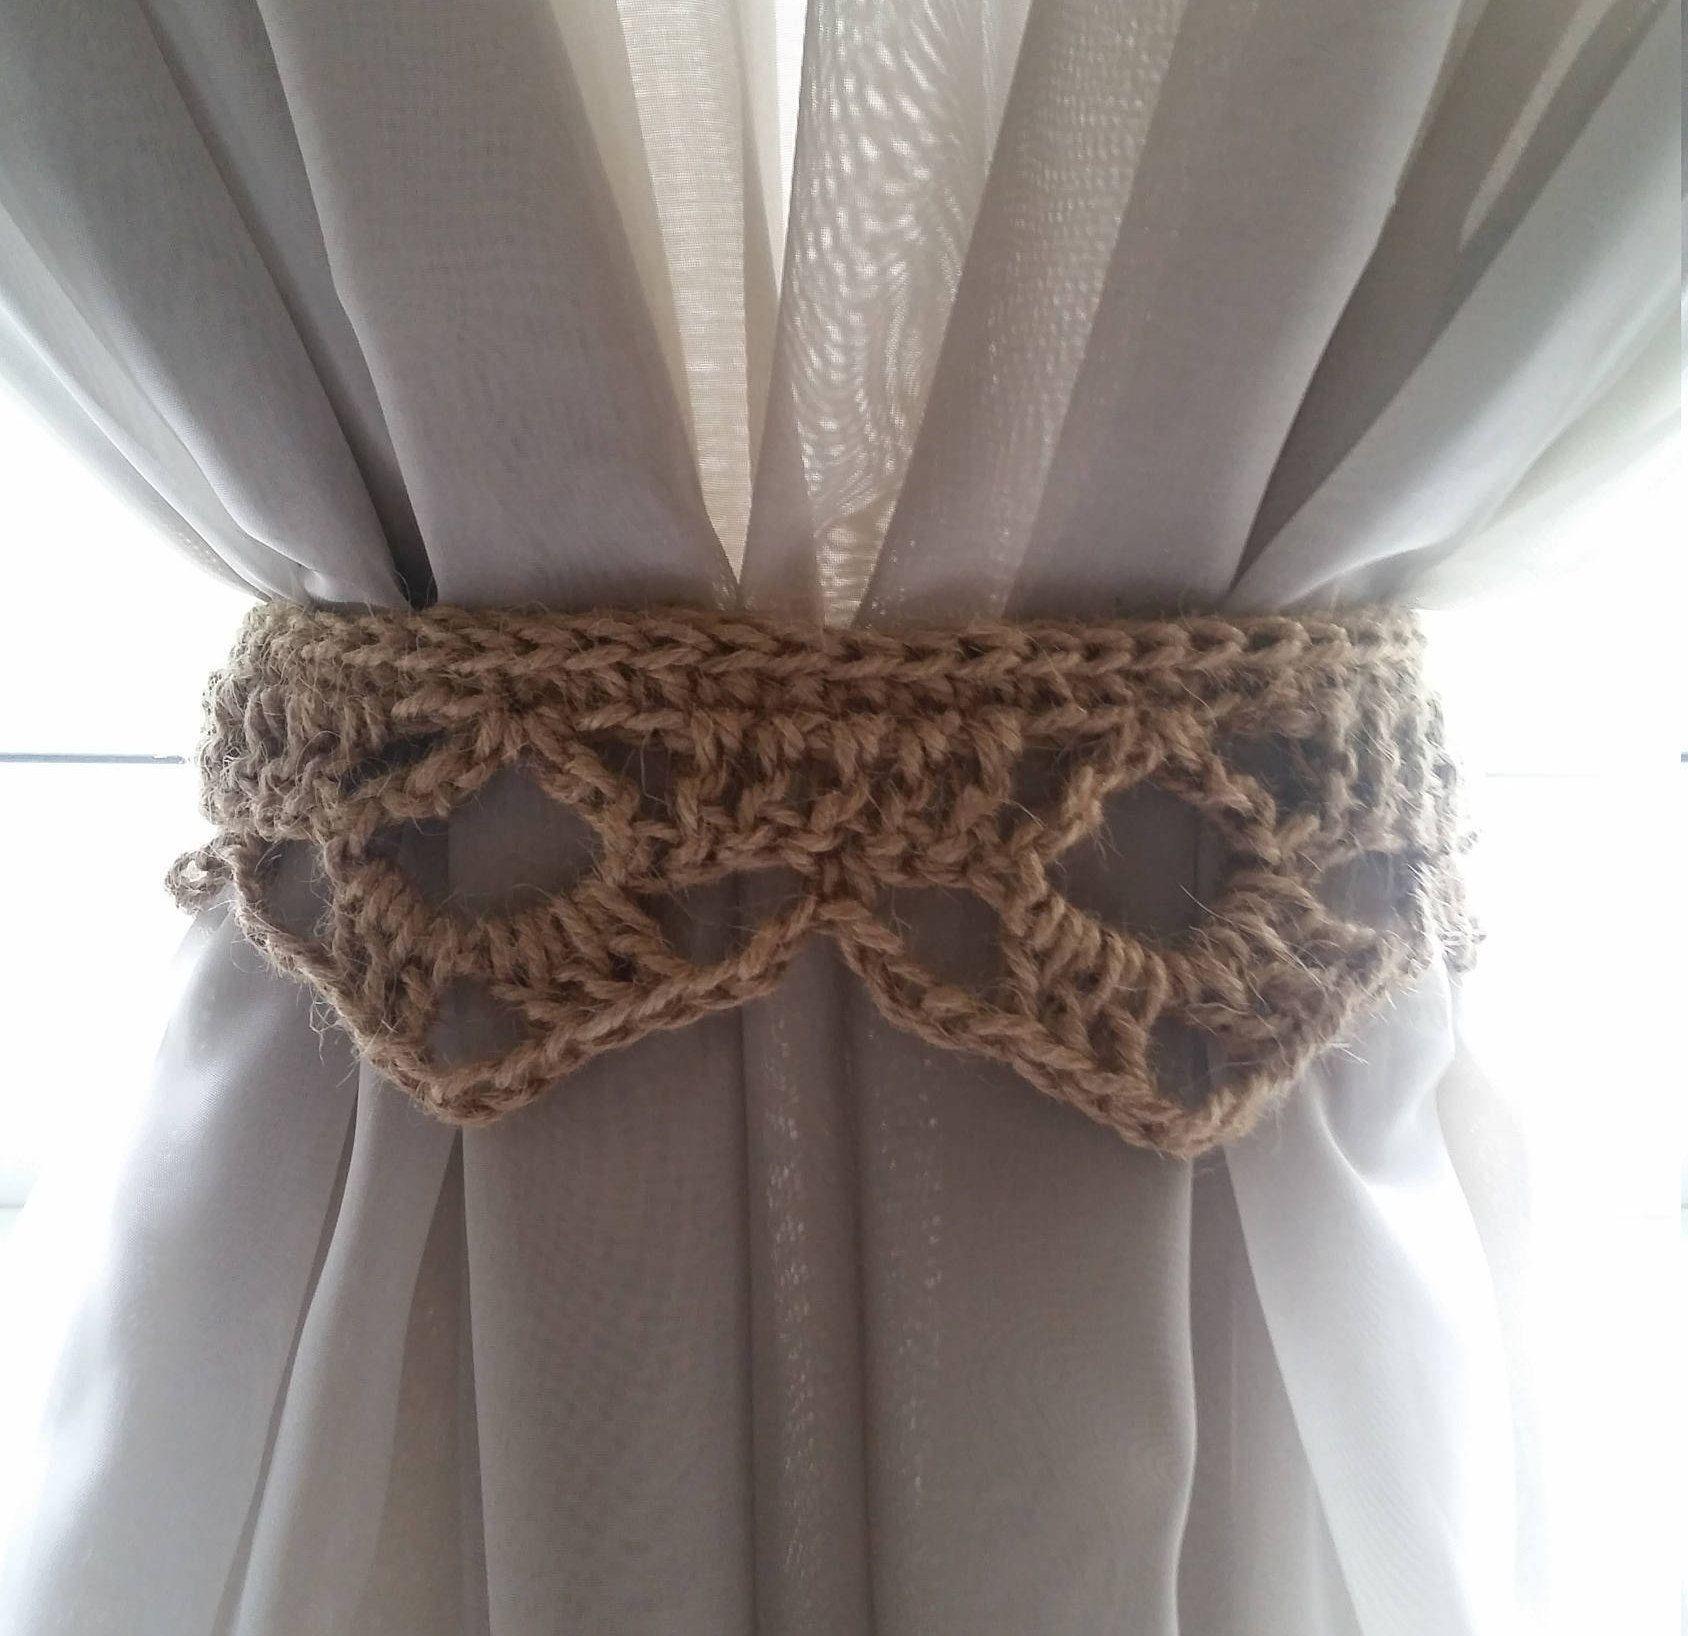 Crochet Curtain Ties Rustic Curtain Tie Back Natural Jute Curtain Tie Back Home Decor Border Rustic Window Decor Window Decor Rustic Window